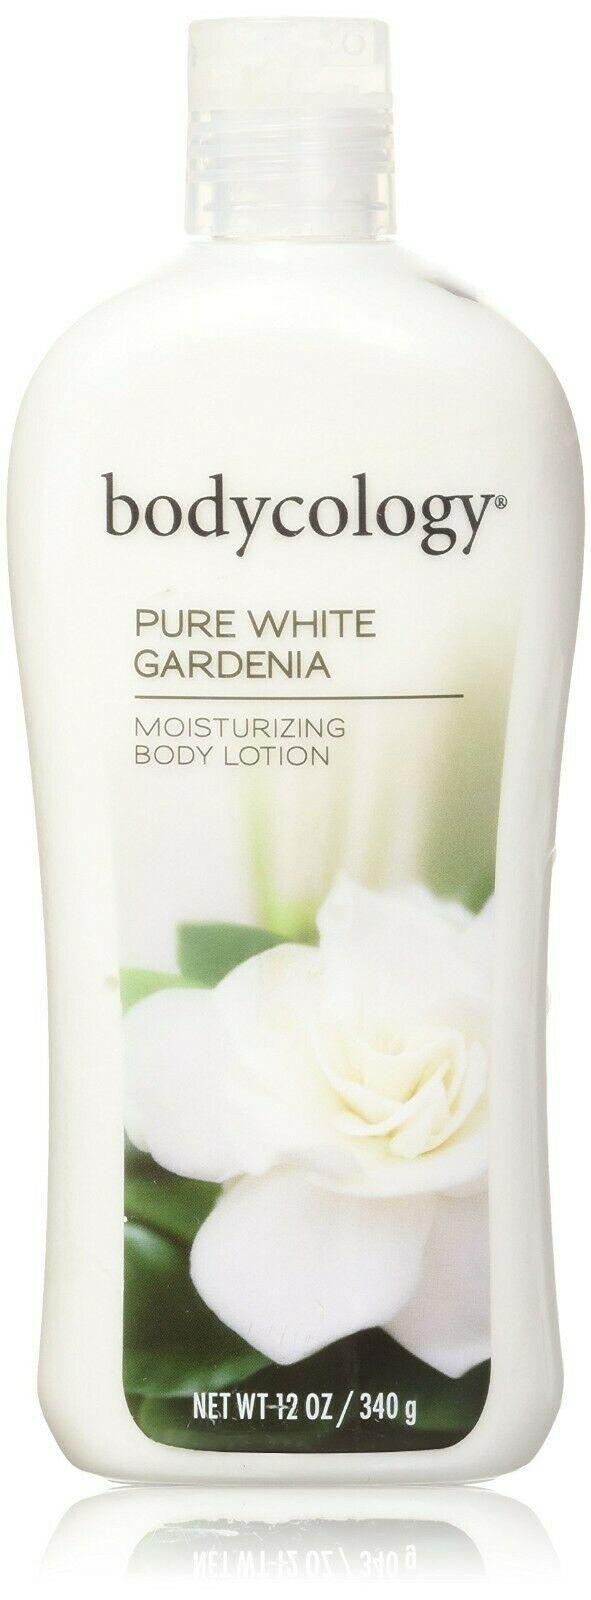 BODYCOLOGY* 12 oz Bottle BODY LOTION Moisturizing PURE WHITE GARDENIA Scented